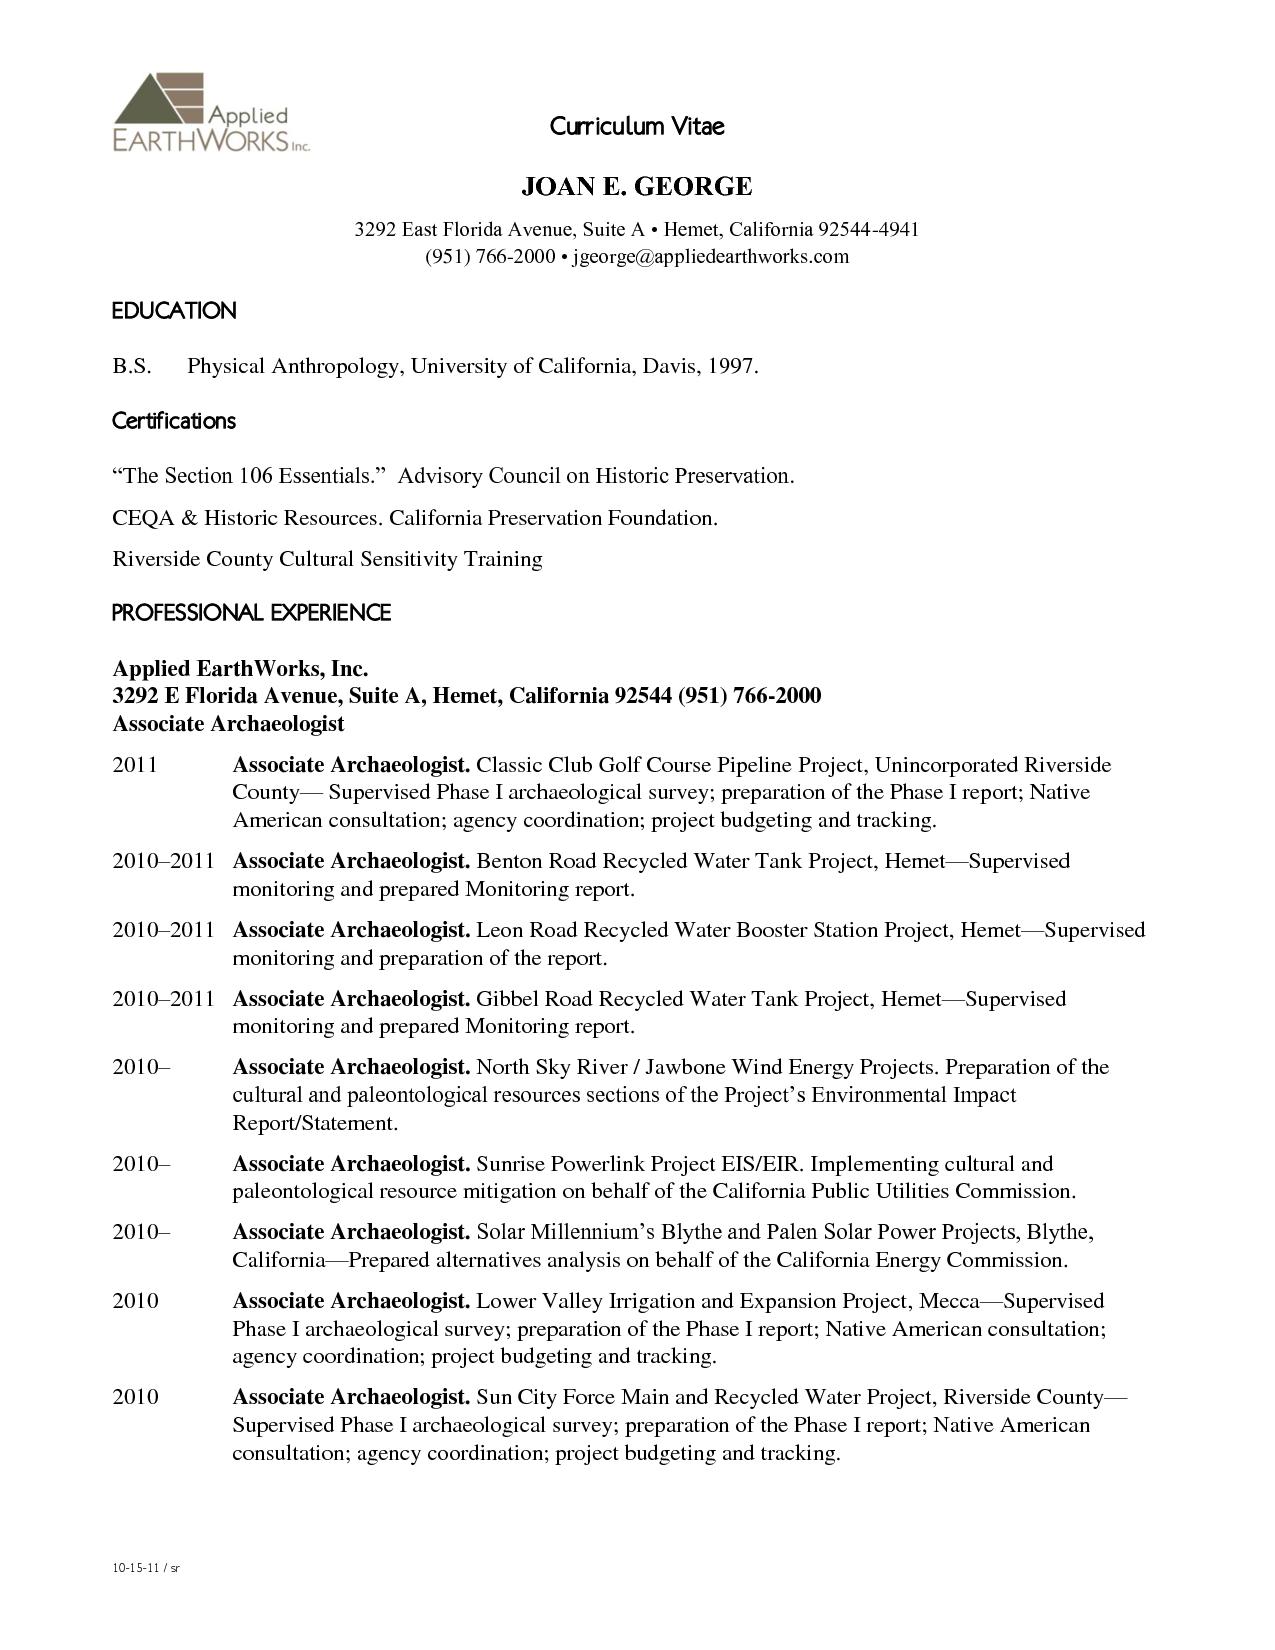 free teacher resume template downloads